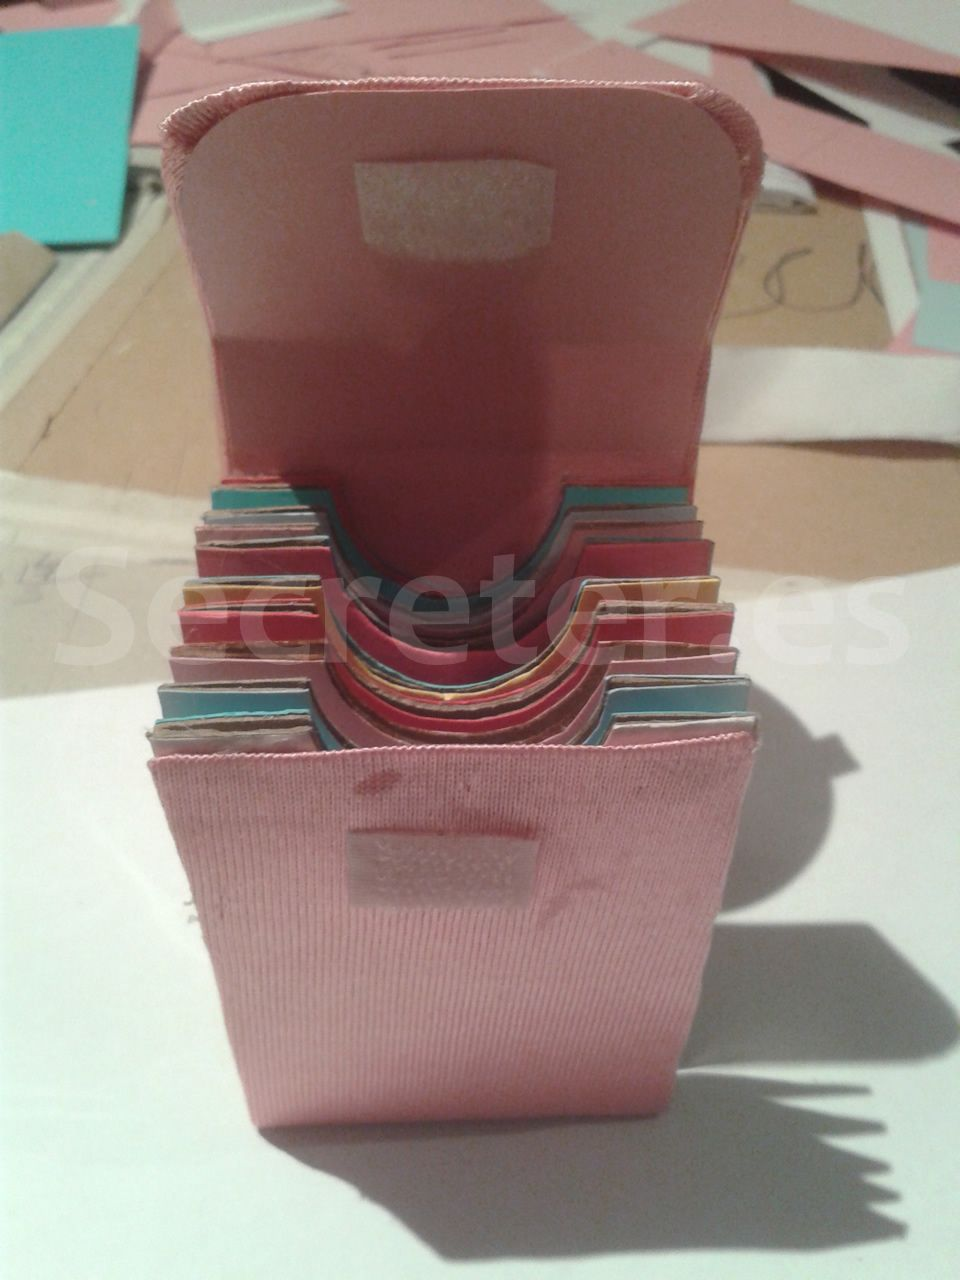 Tarjetero hecho con tubos de papel higi nico http - Manualidades en papel ...